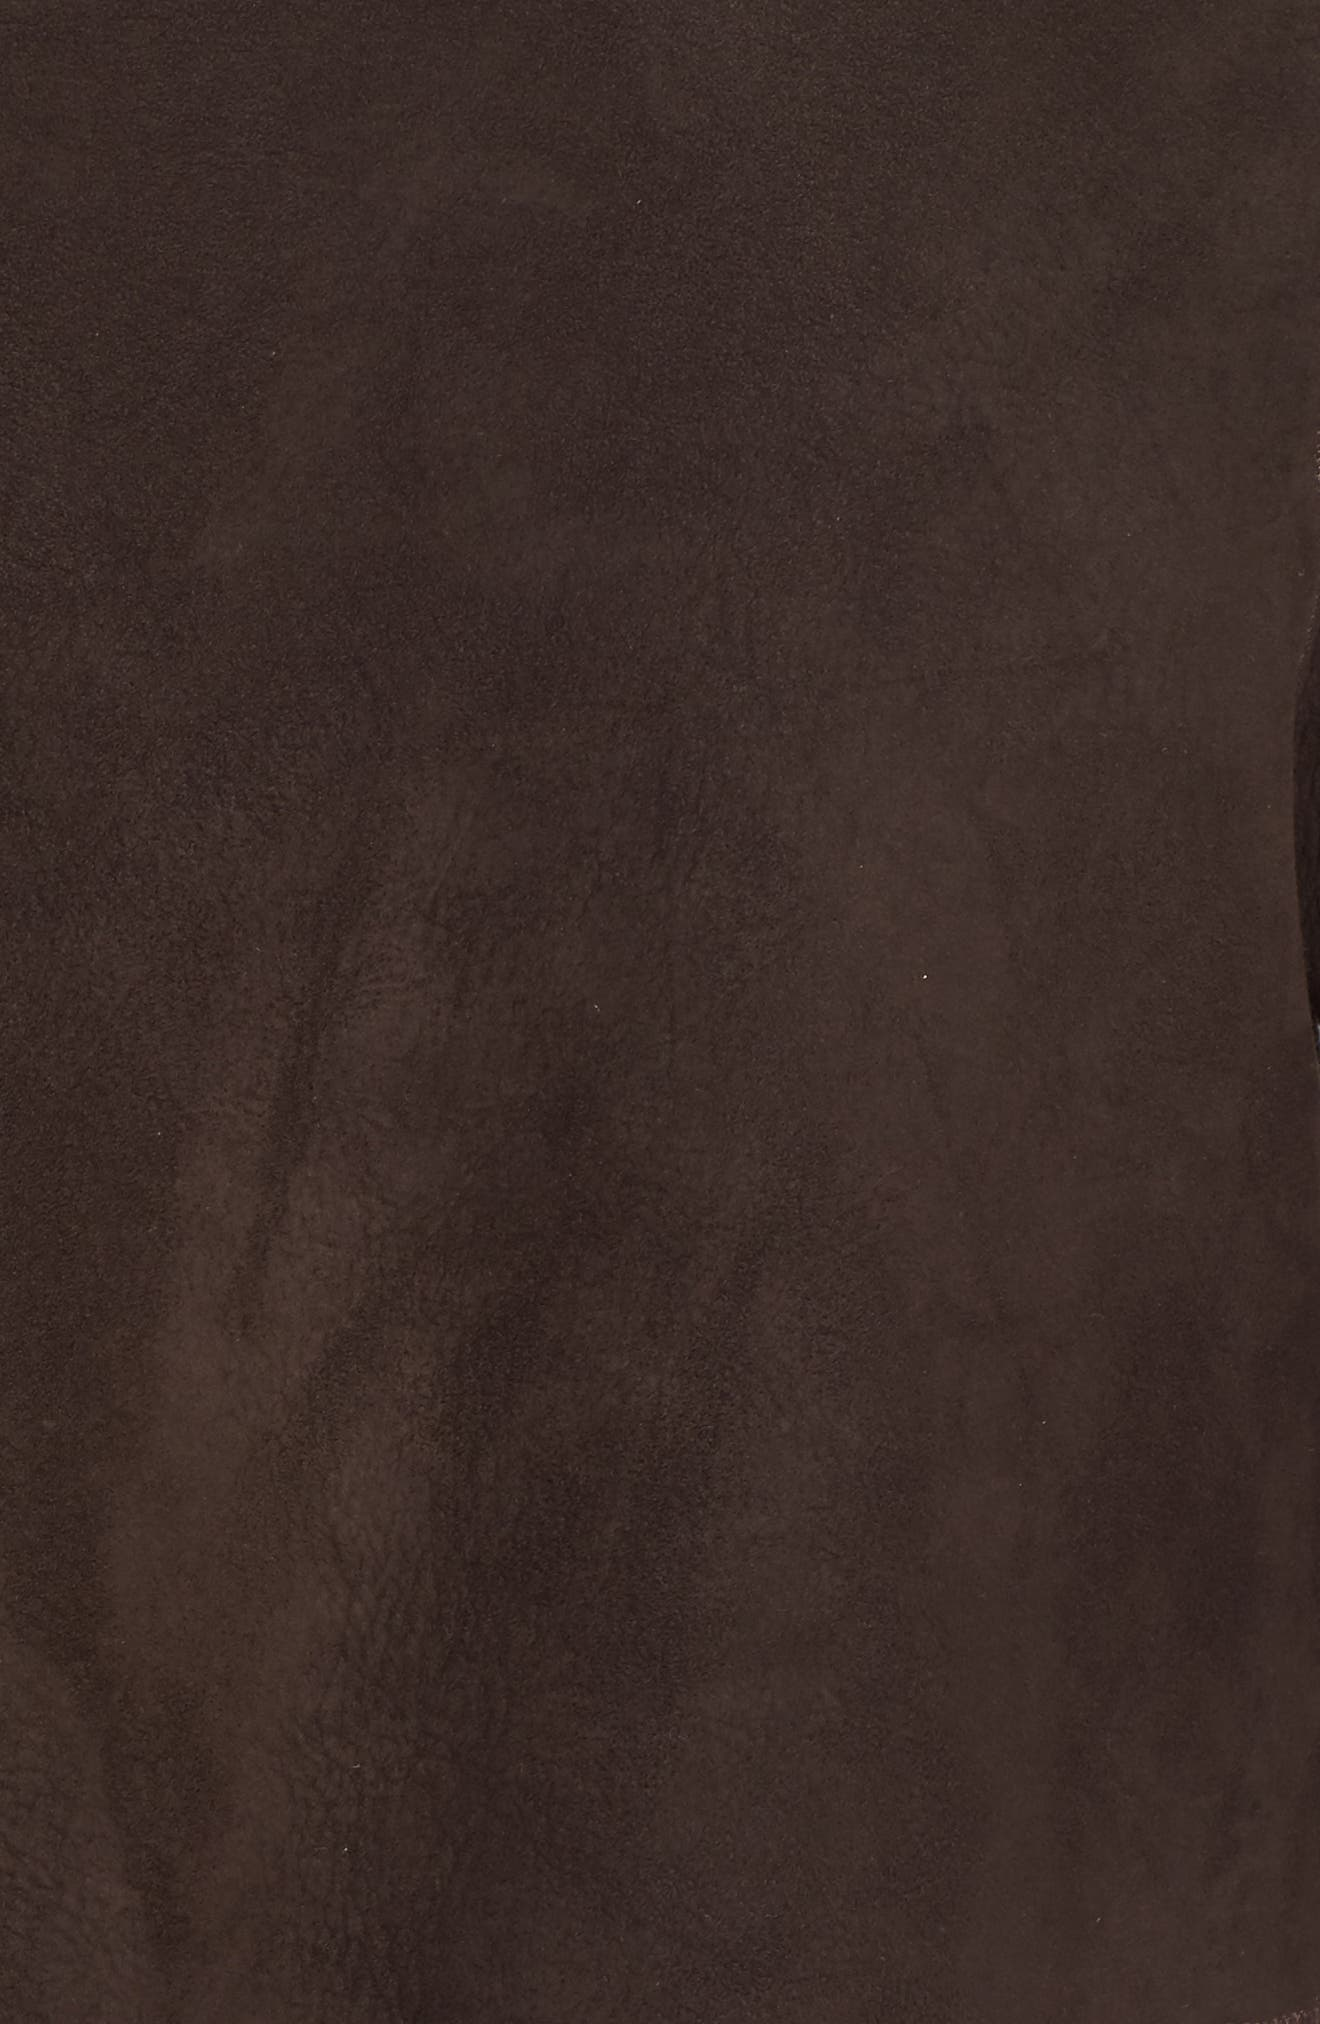 Hooded Genuine Shearling Coat,                             Alternate thumbnail 5, color,                             Walnut